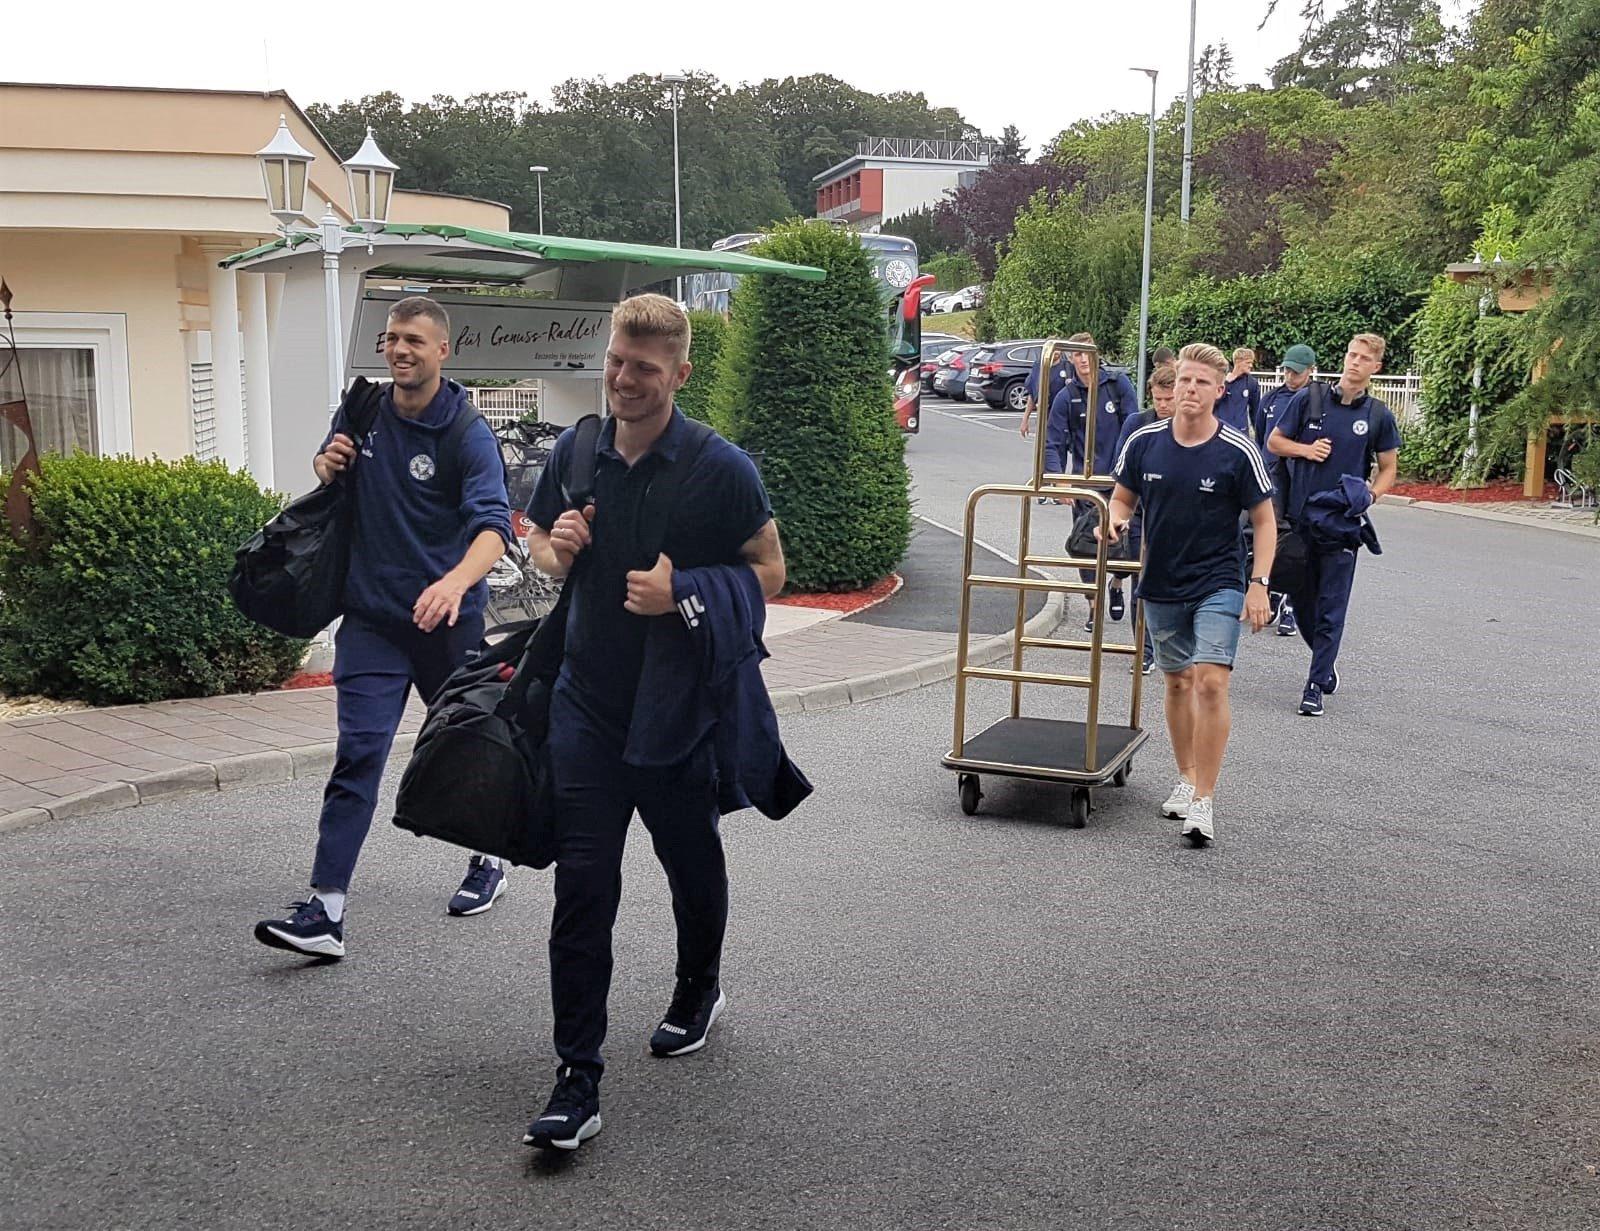 Der KSV-Tross um Jonas Meffert und Alexander Mühling (v. li.) kommt im Avita Resort in Bad Tatzmannsdorf an.